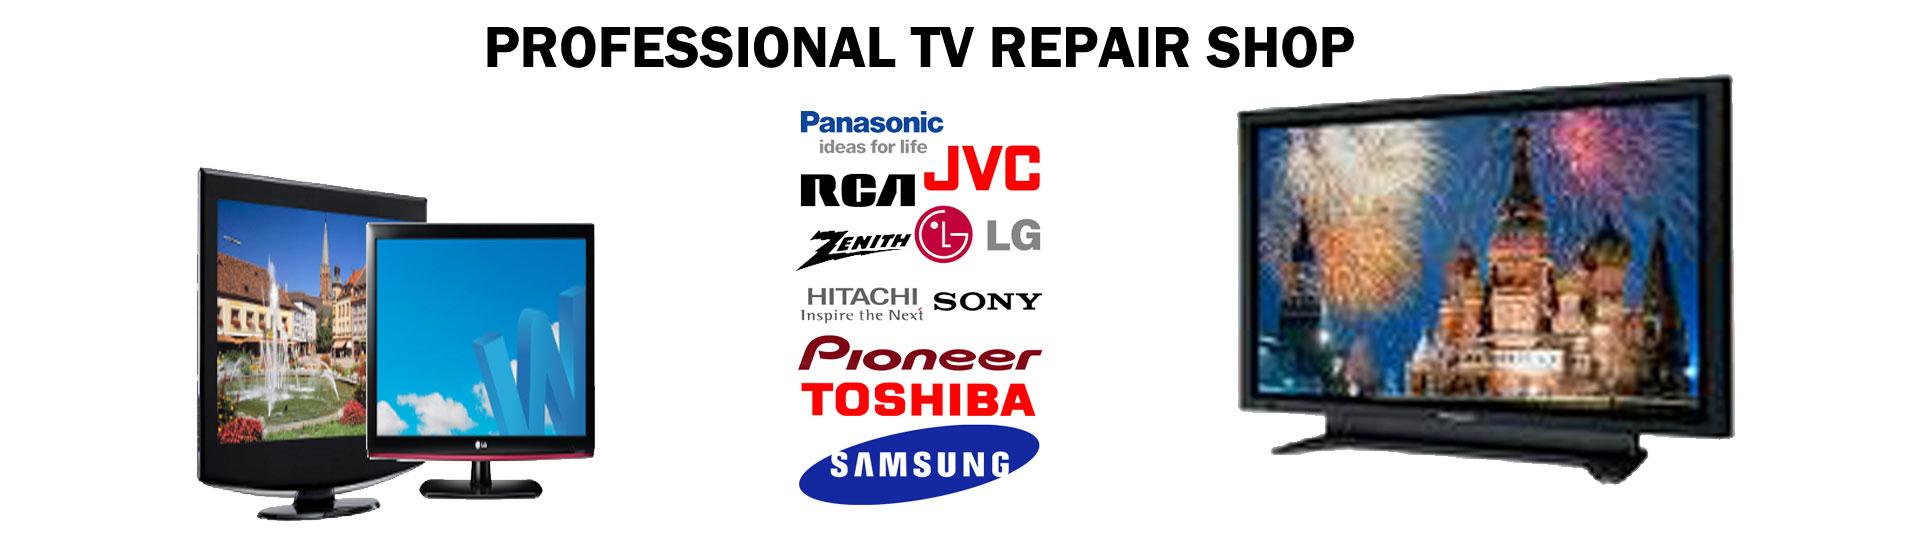 Led Lcd Tv Repair Gurgaon Electronics Service Center Delhigurgaon Pcb Board Circuit Induction Cooker Intelligent